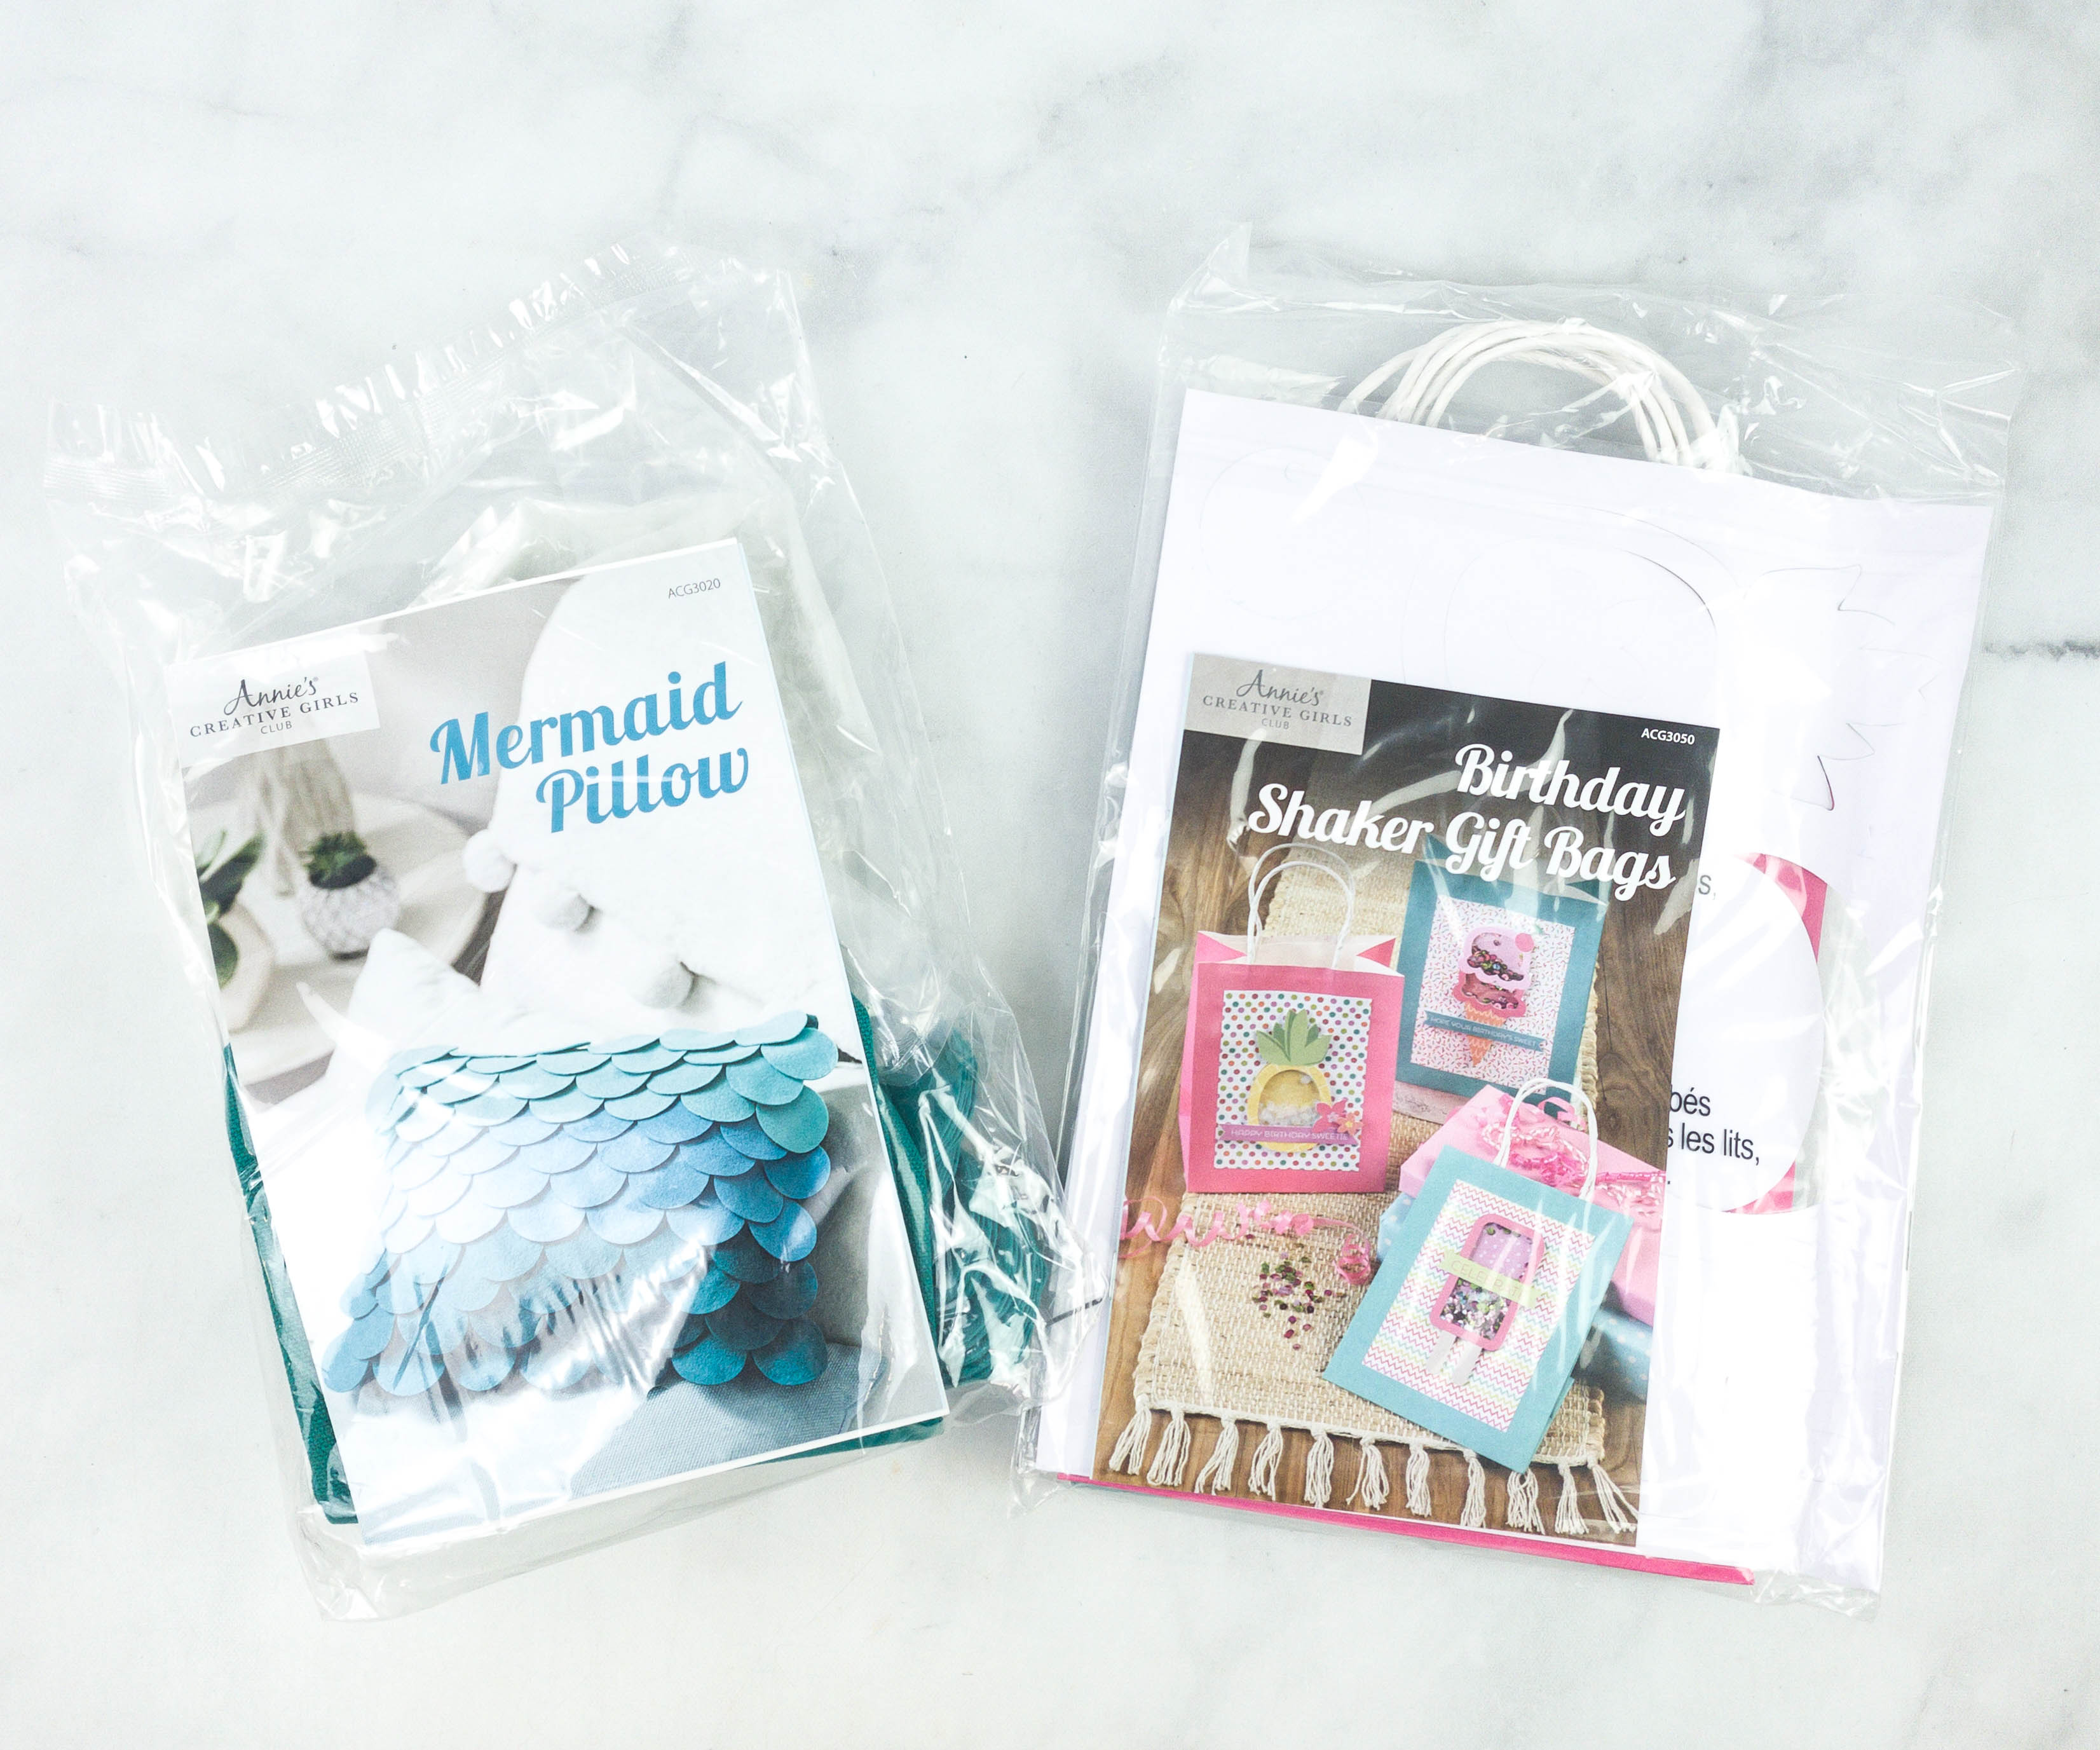 mermaid pillow birthday gift bags